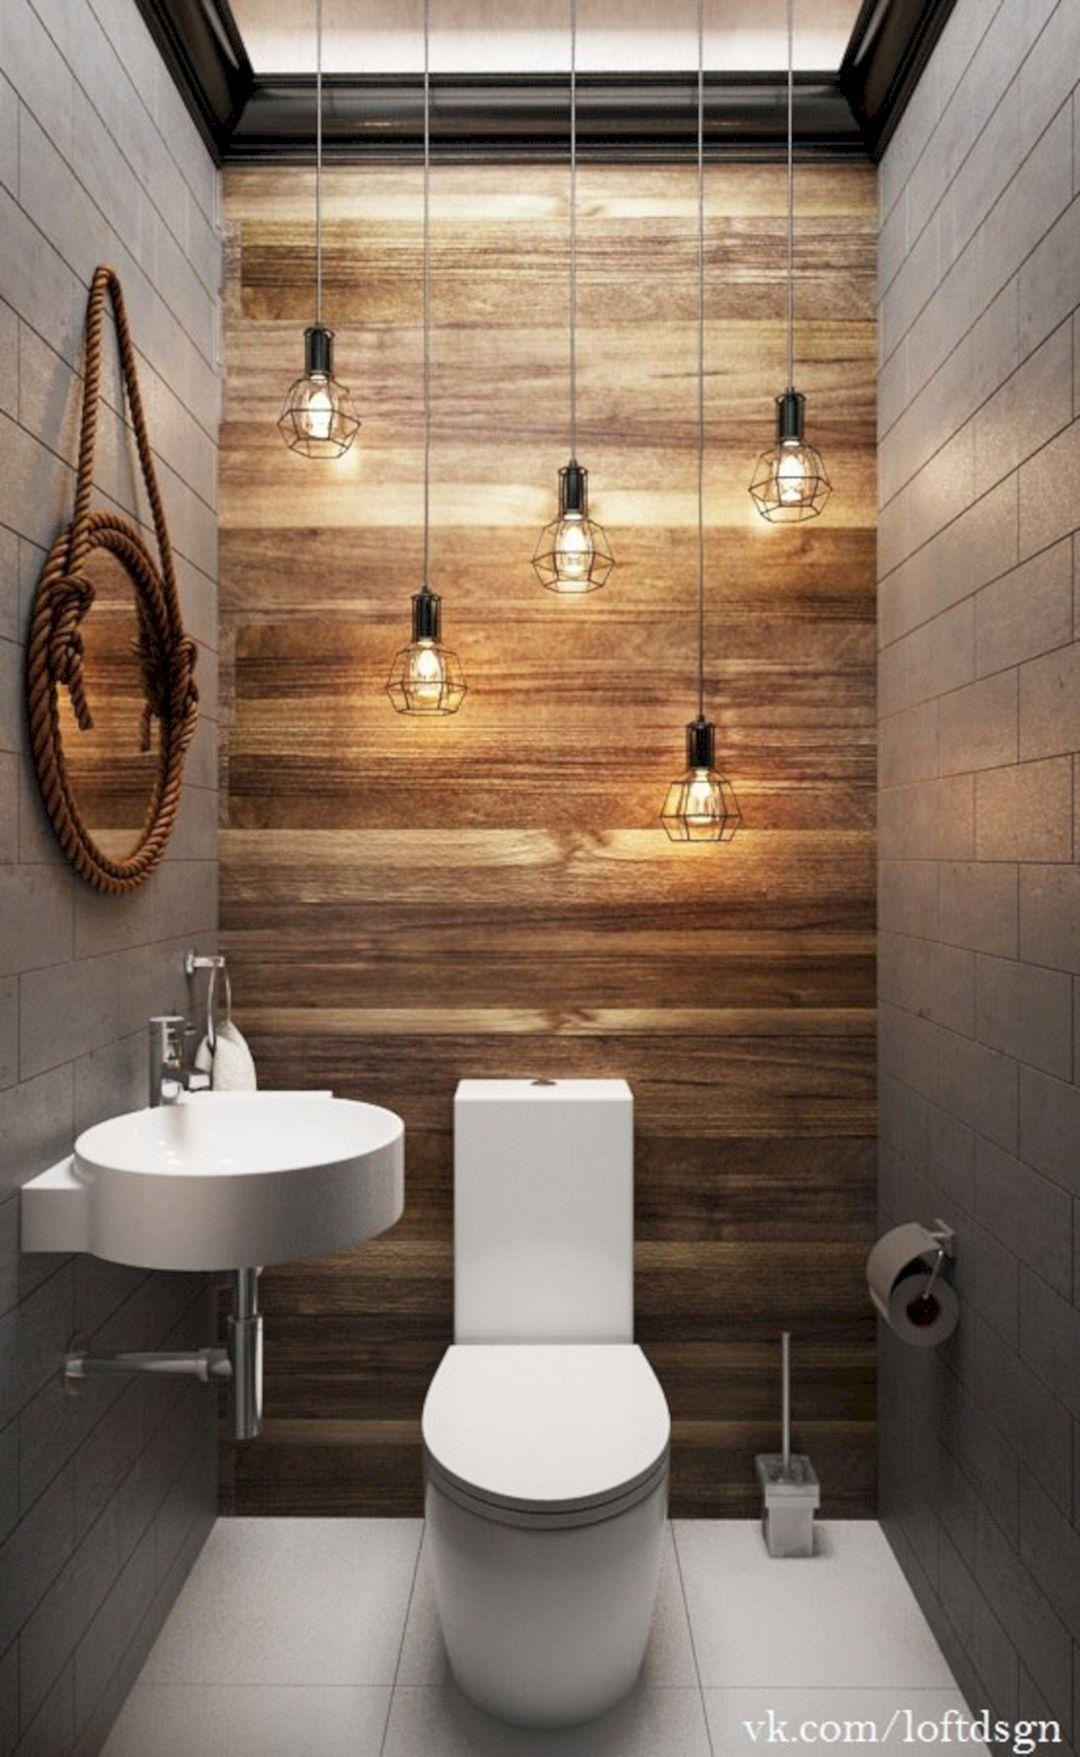 Bathroom Designs Small Space Delectable 115 Extraordinary Small Bathroom Designs For Small Space 0104 Design Decoration